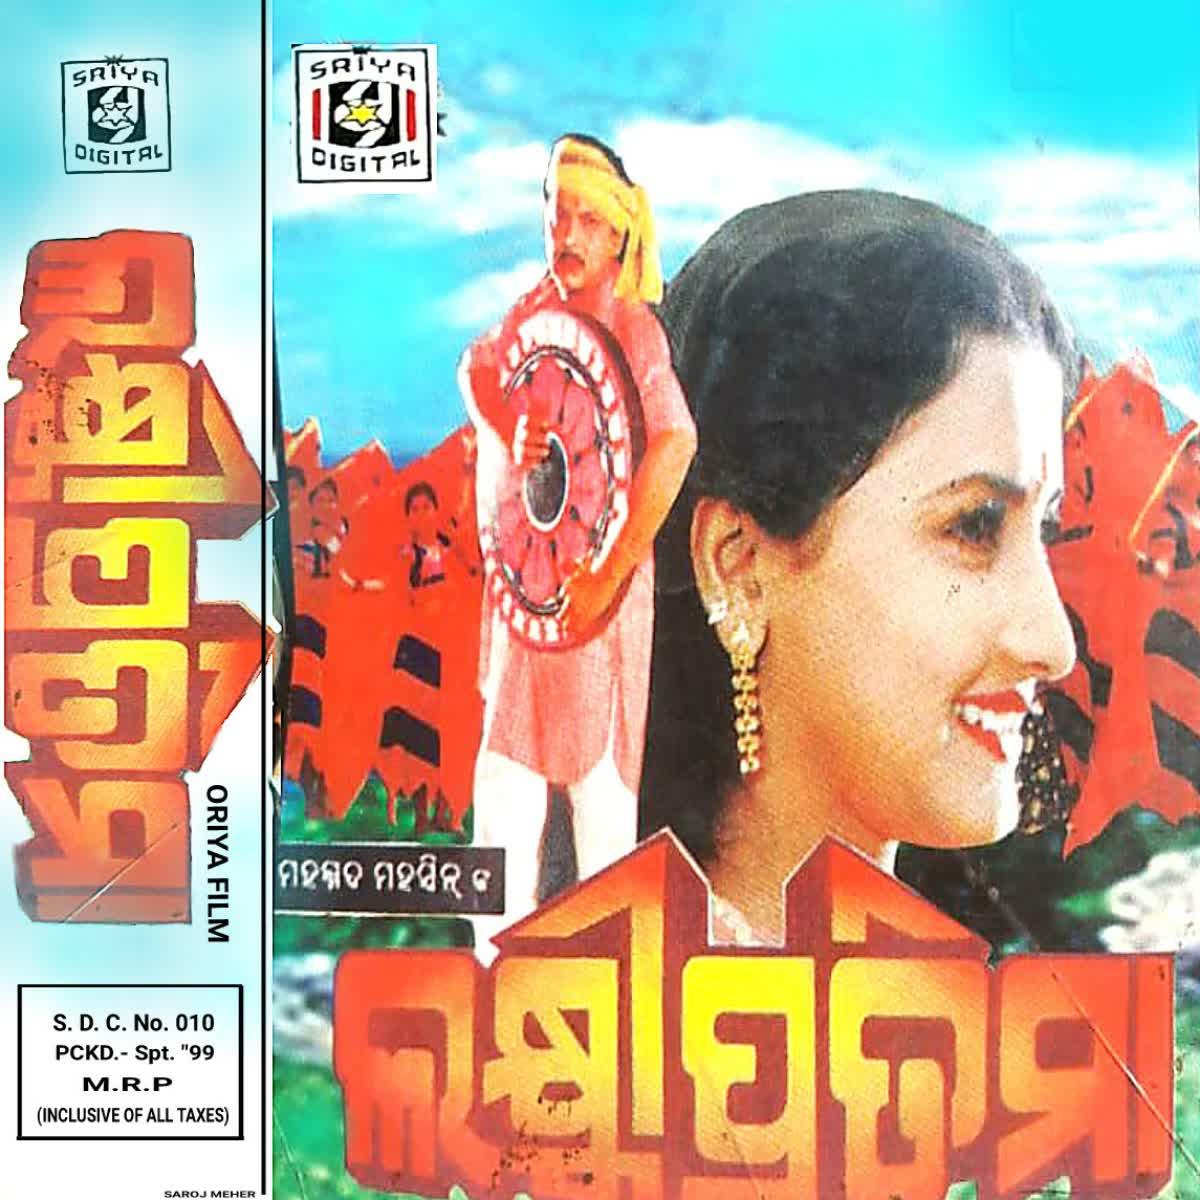 Kala Meghi - Kand Nare Kand Nare Banara Sari (Lakshmi Pratima)